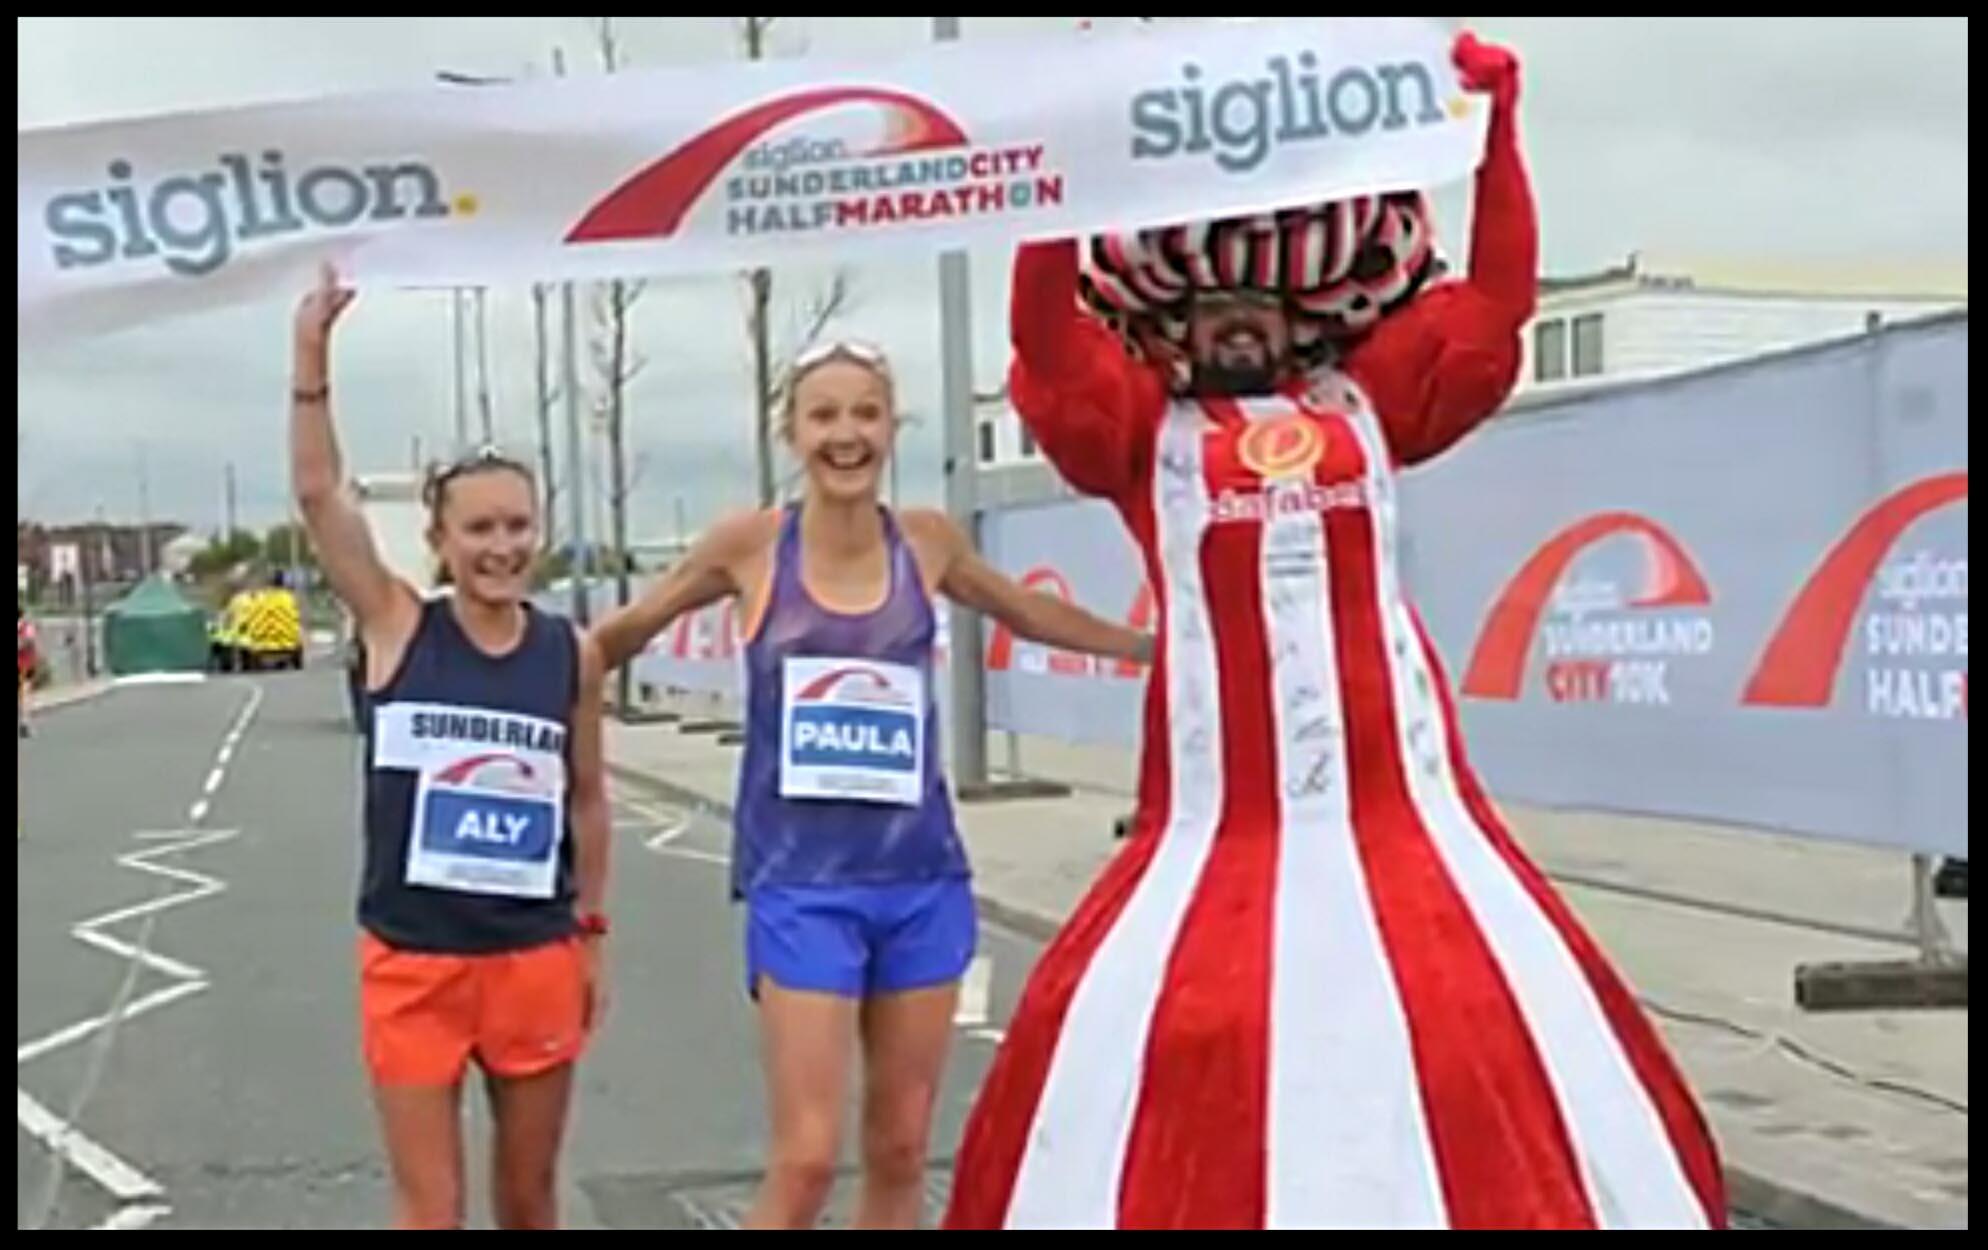 Big-Pink-Dress-THAT-Branding-Company-Sunderland-10km-2017-00152